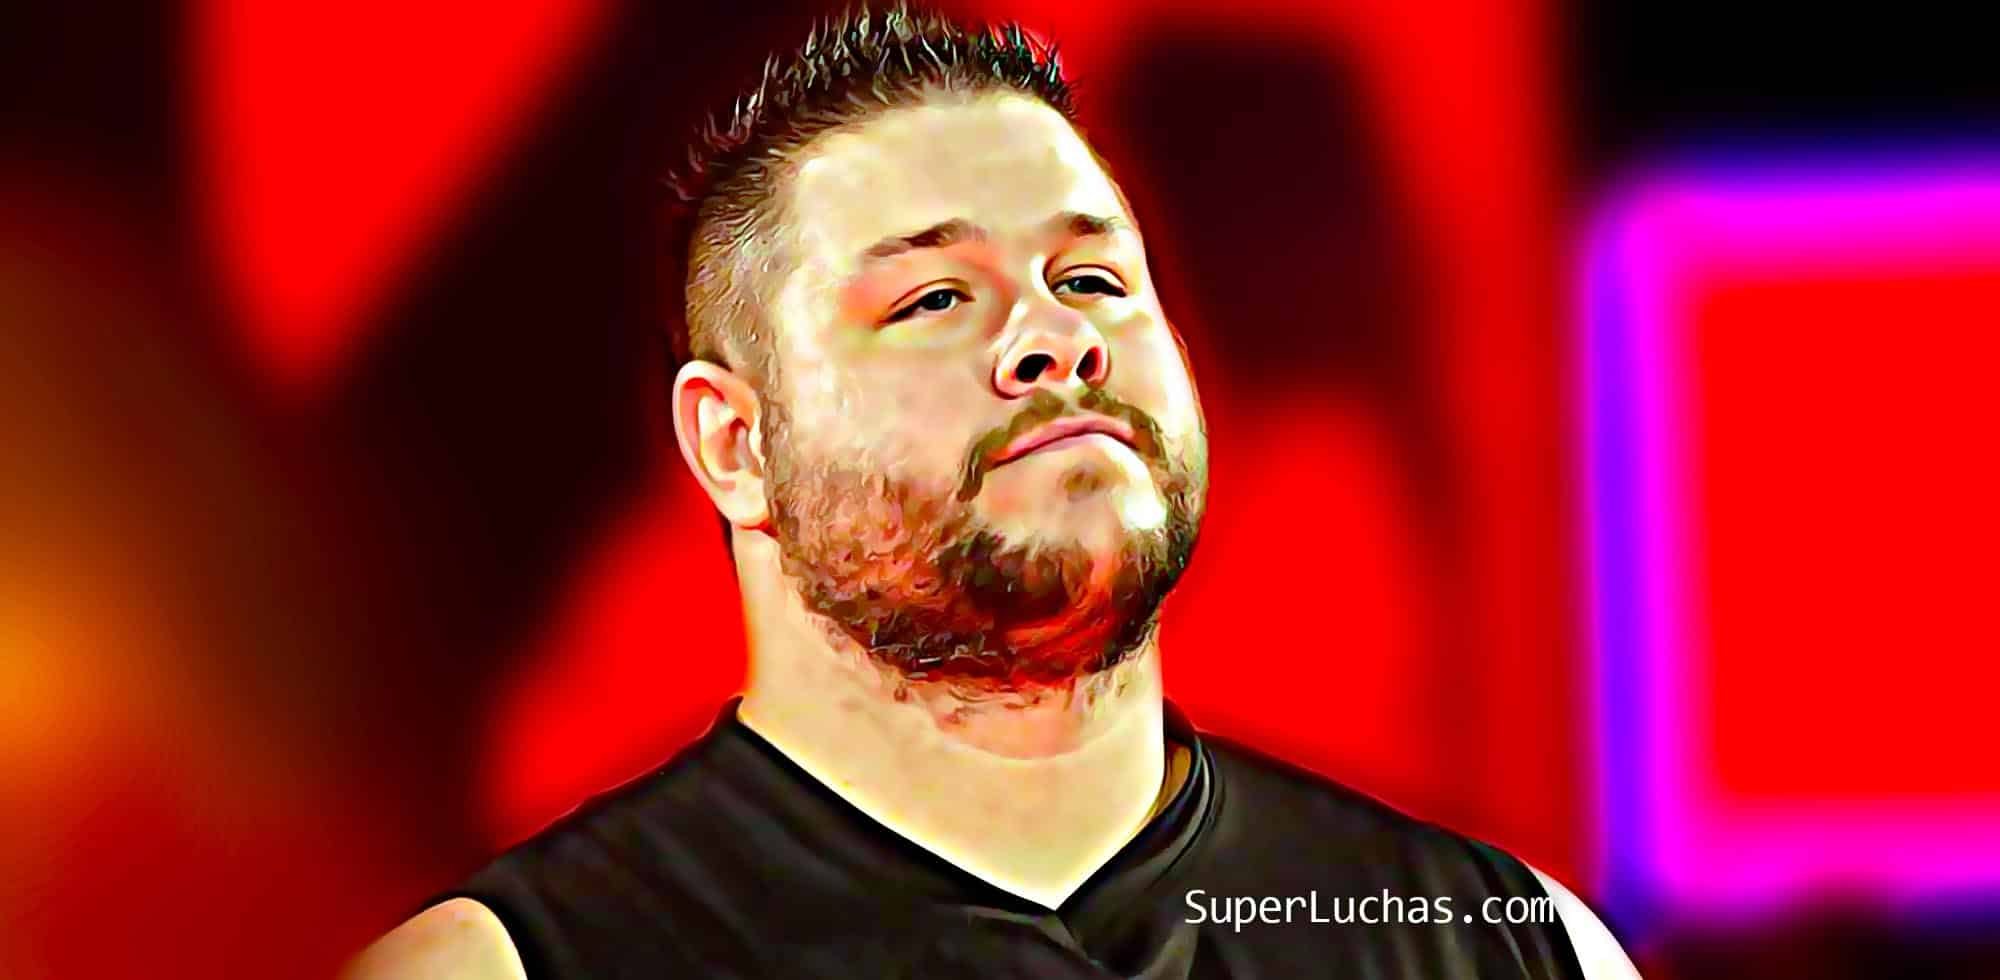 Rivales para Brock Lesnar antes del retiro